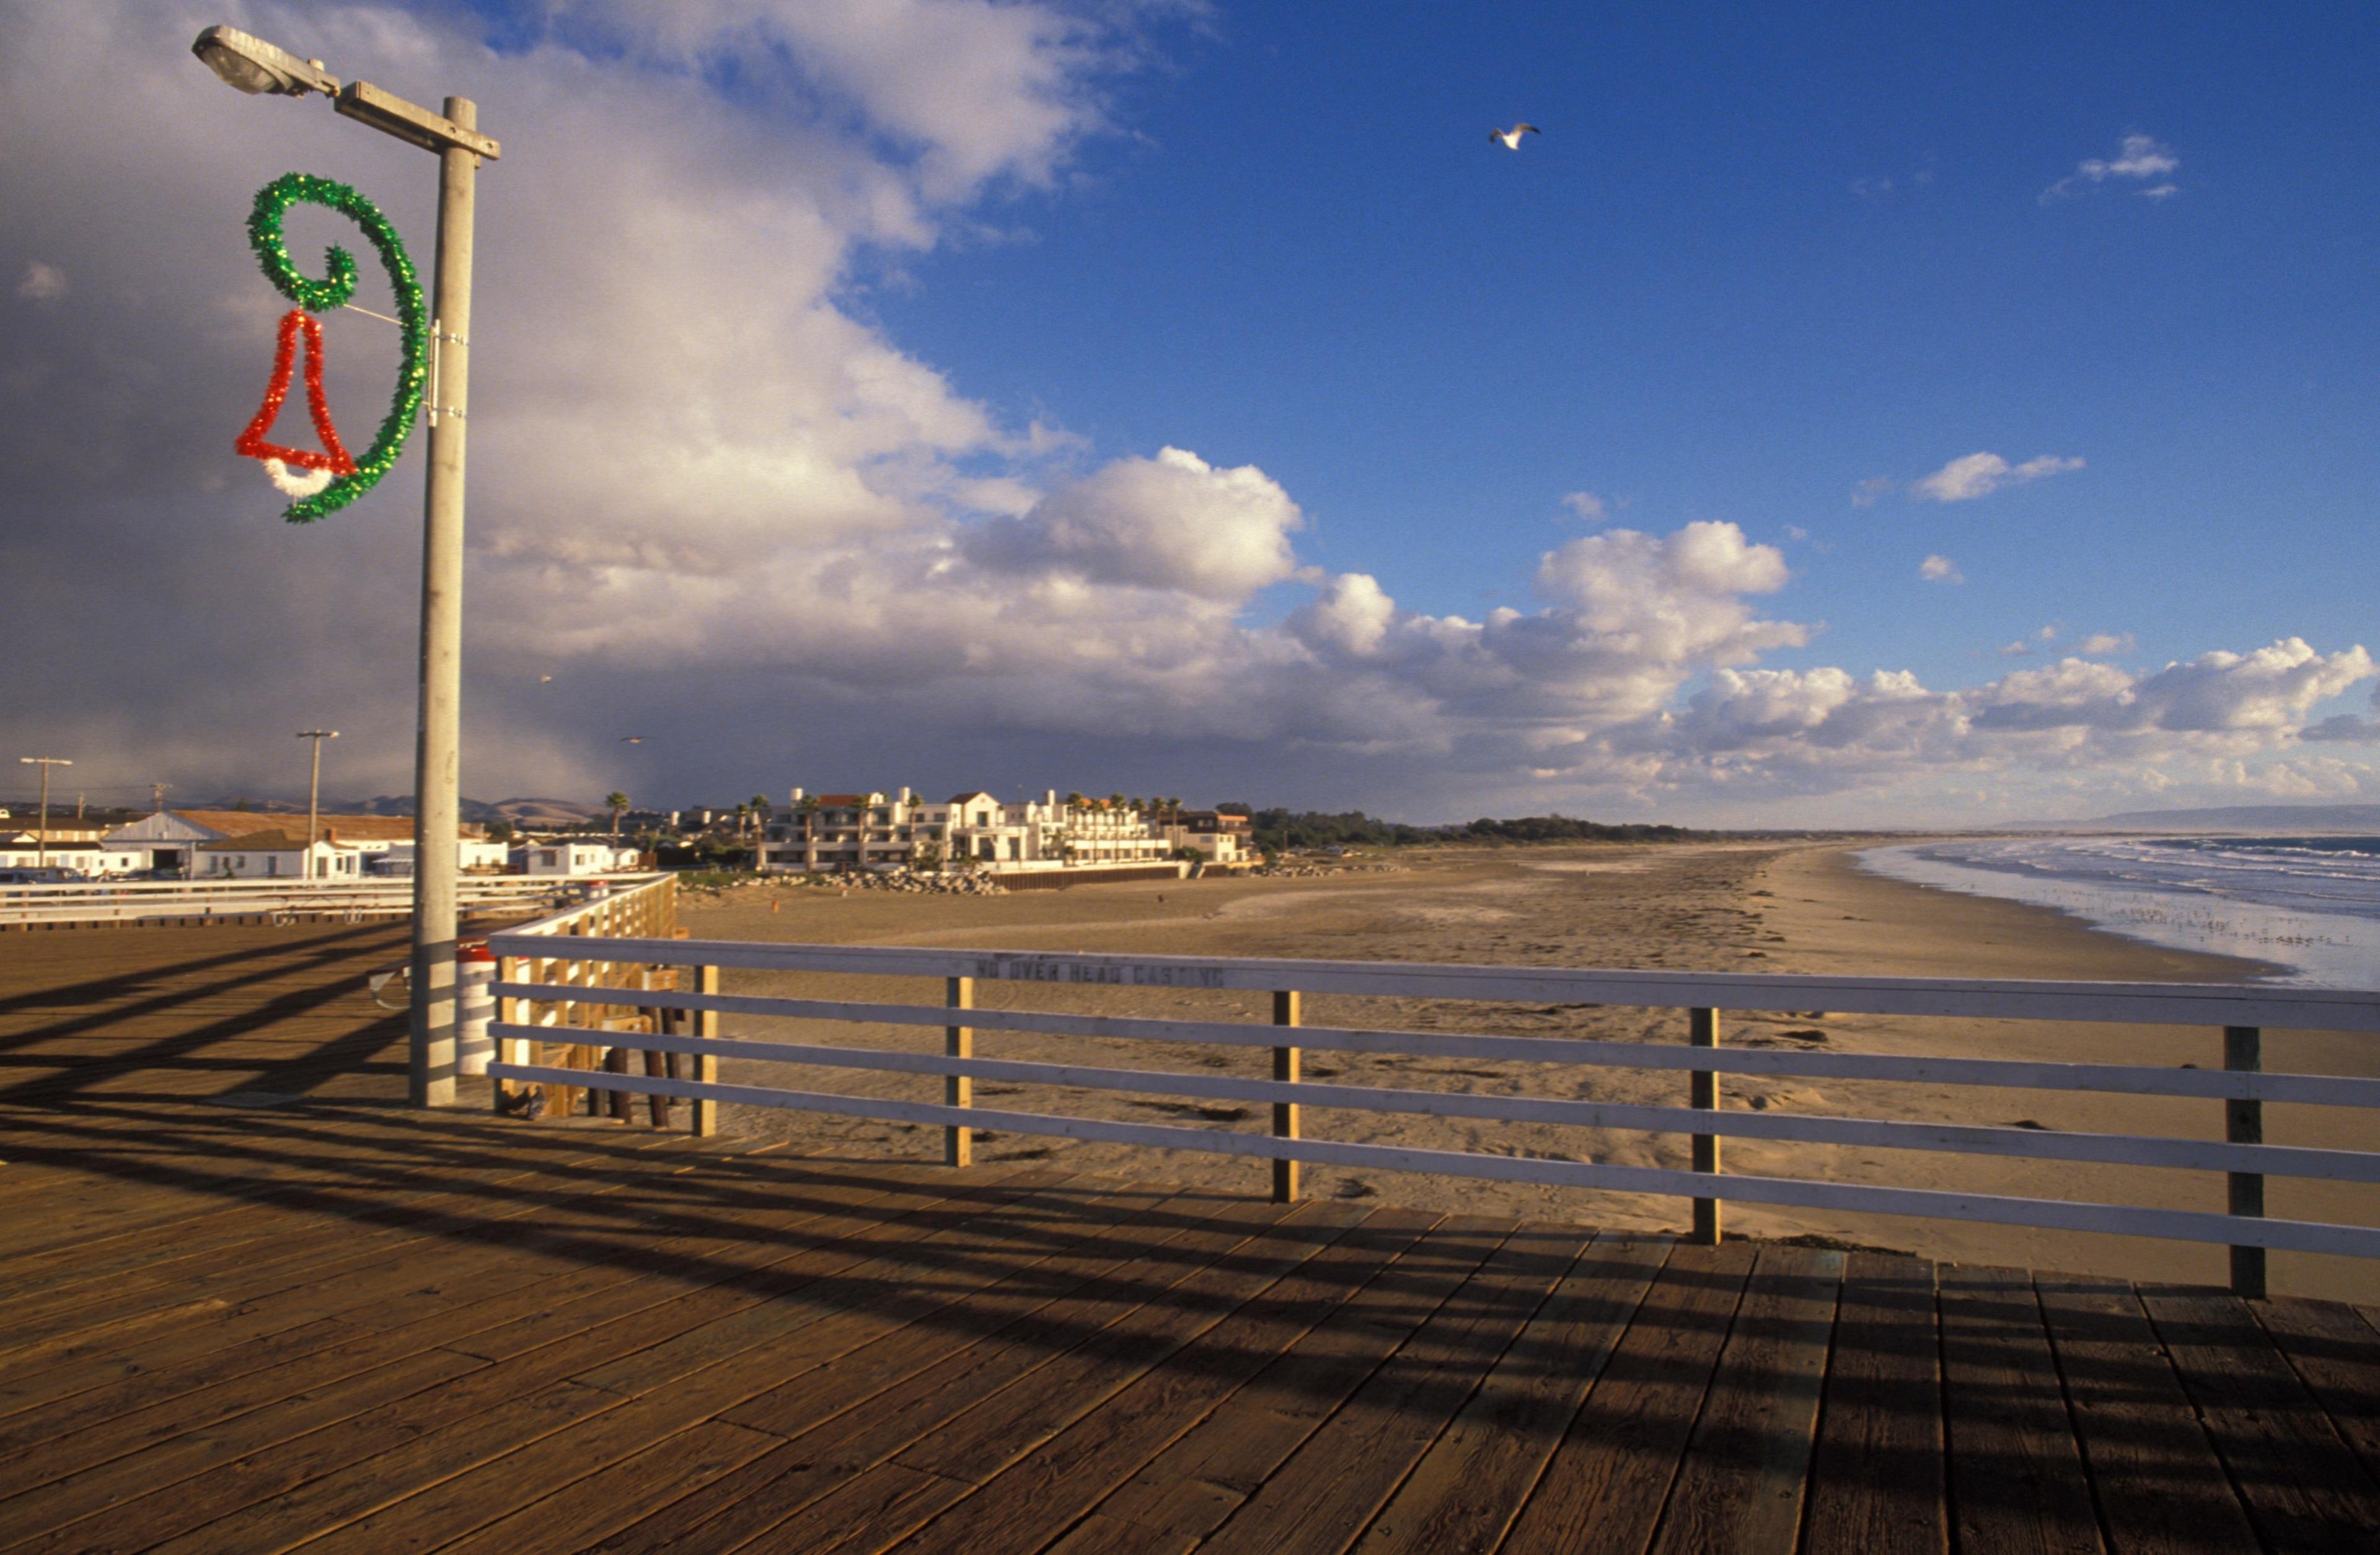 Grover Beach, California, United States of America